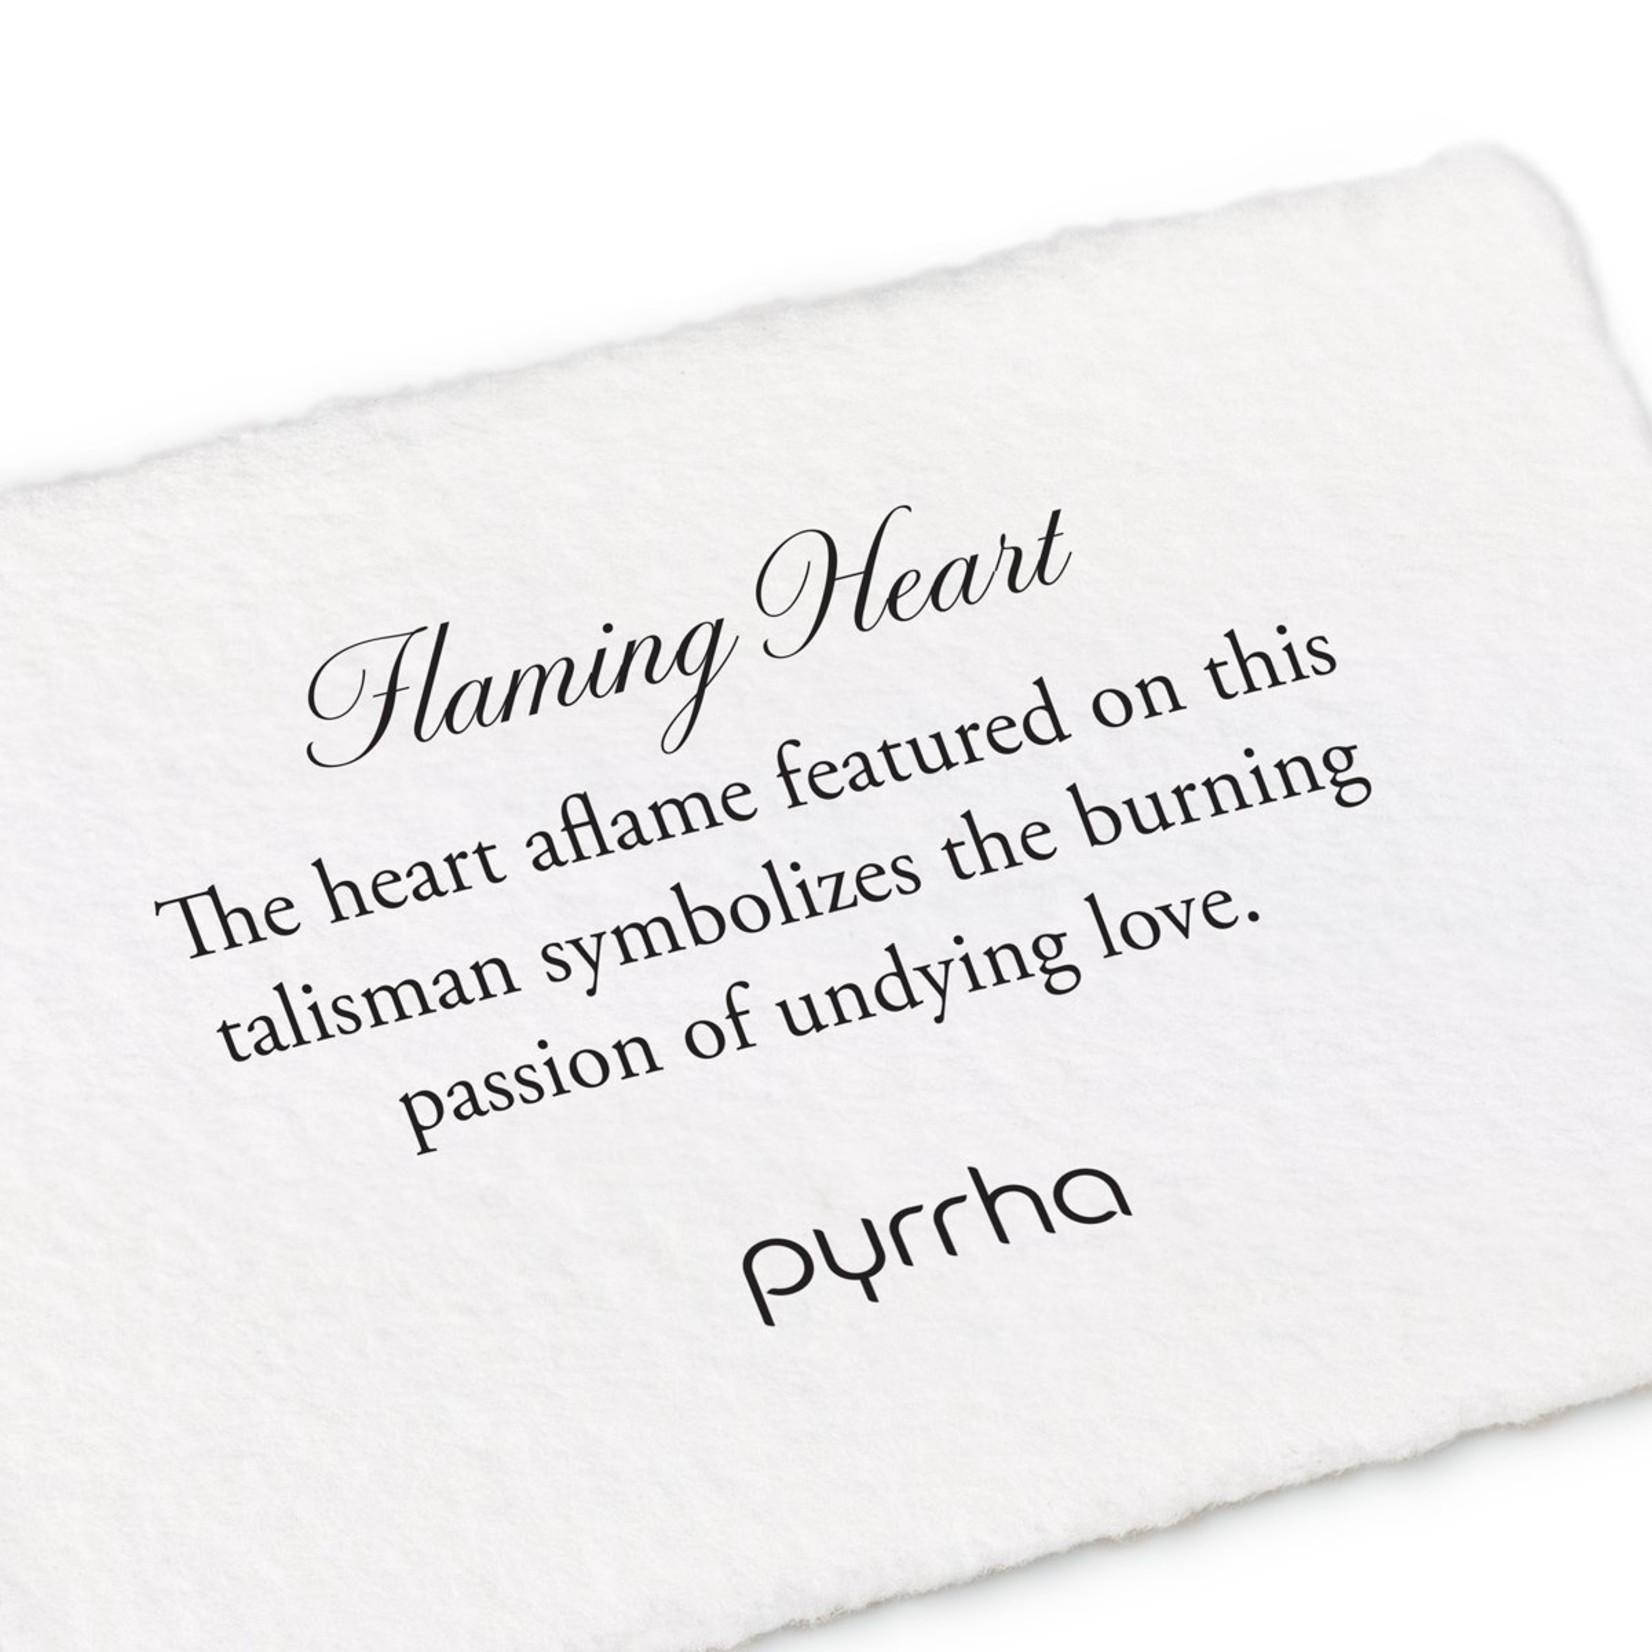 Pyrrha Flaming Heart Signature Talisman